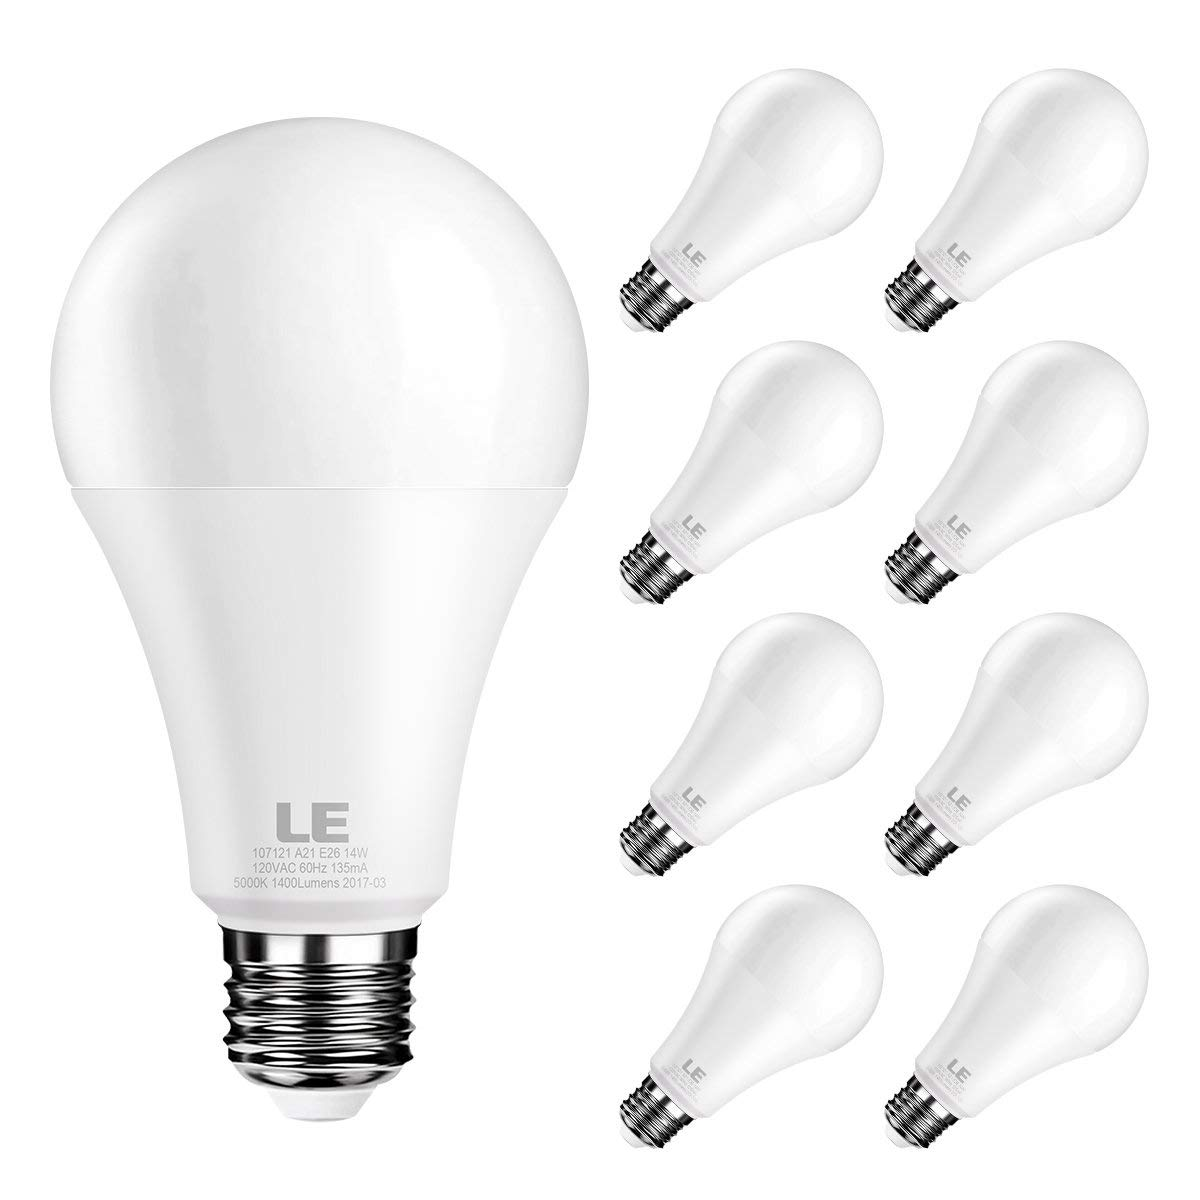 Super Bright 1200 Lumens 5000K Daylight White 13W LED Bulbs LE 100 Watt Equivalent A21 LED Light Bulbs 200 degree Beam Angle Non-Dimmable E26 Medium Base Bulbs Pack of 8